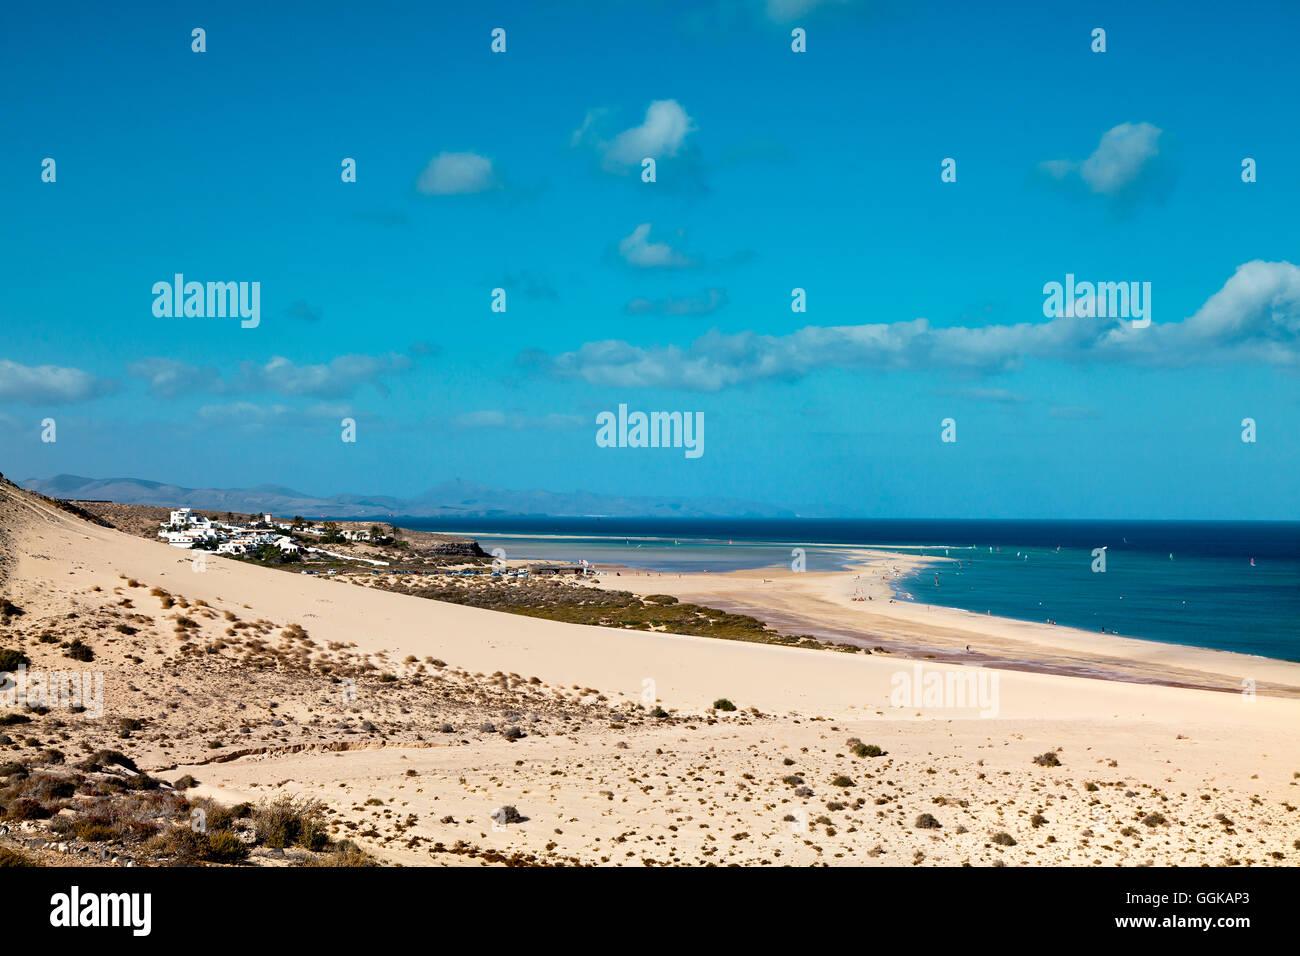 Beach at Playa Barca, Playa de Sotavento, Fuerteventura, Canary Islands, Spain - Stock Image